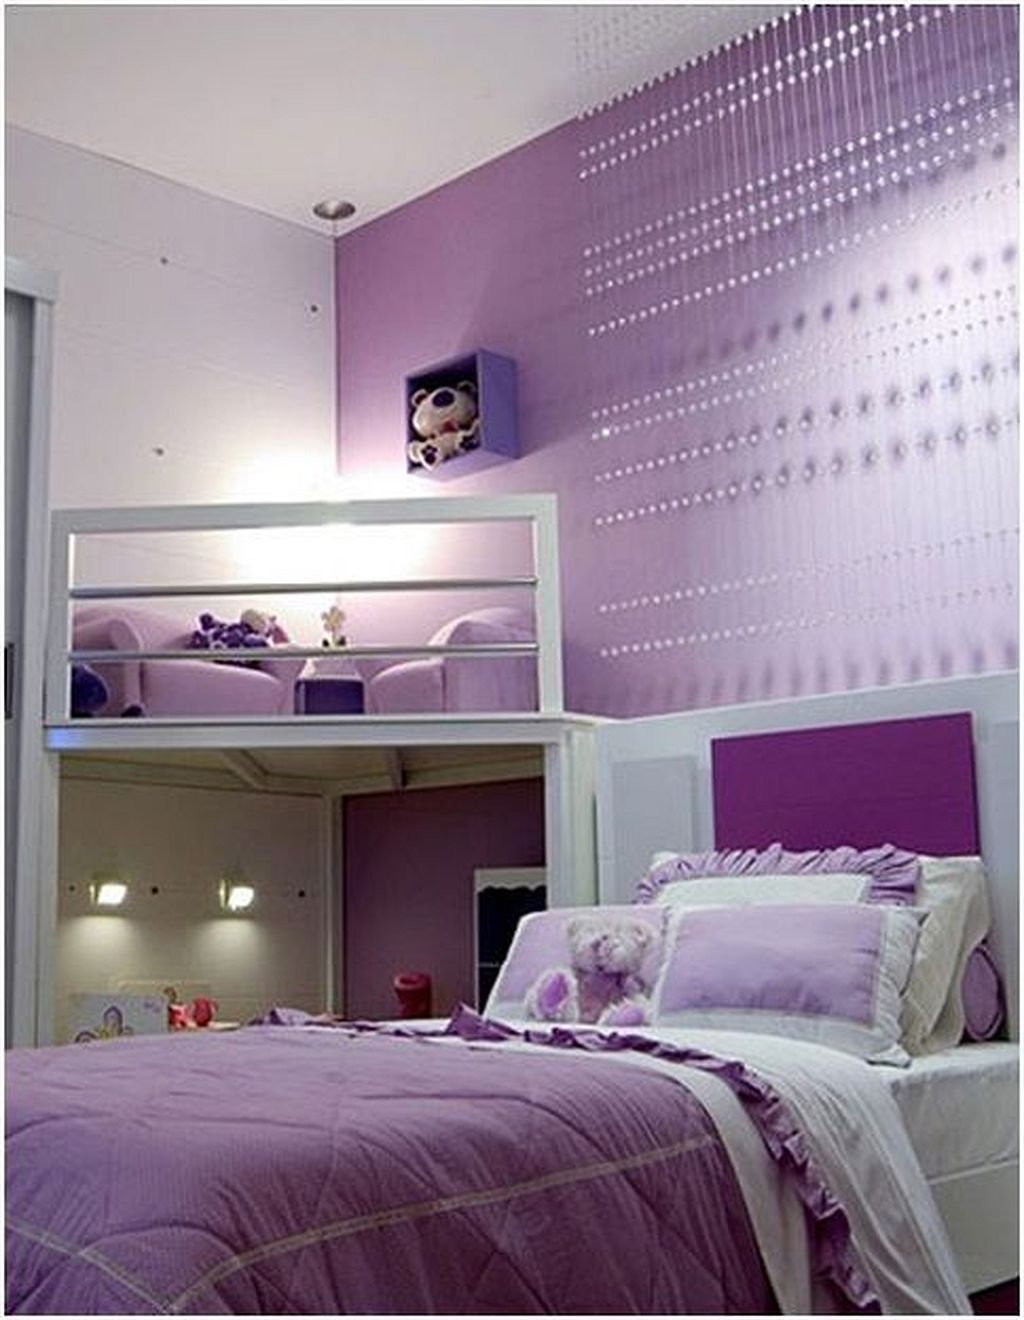 Best Kitchen Gallery: 70 Teen Girl Bedroom Design Ideas Bedrooms Teen And Nice of Bedroom Design Ideas For Girls  on rachelxblog.com